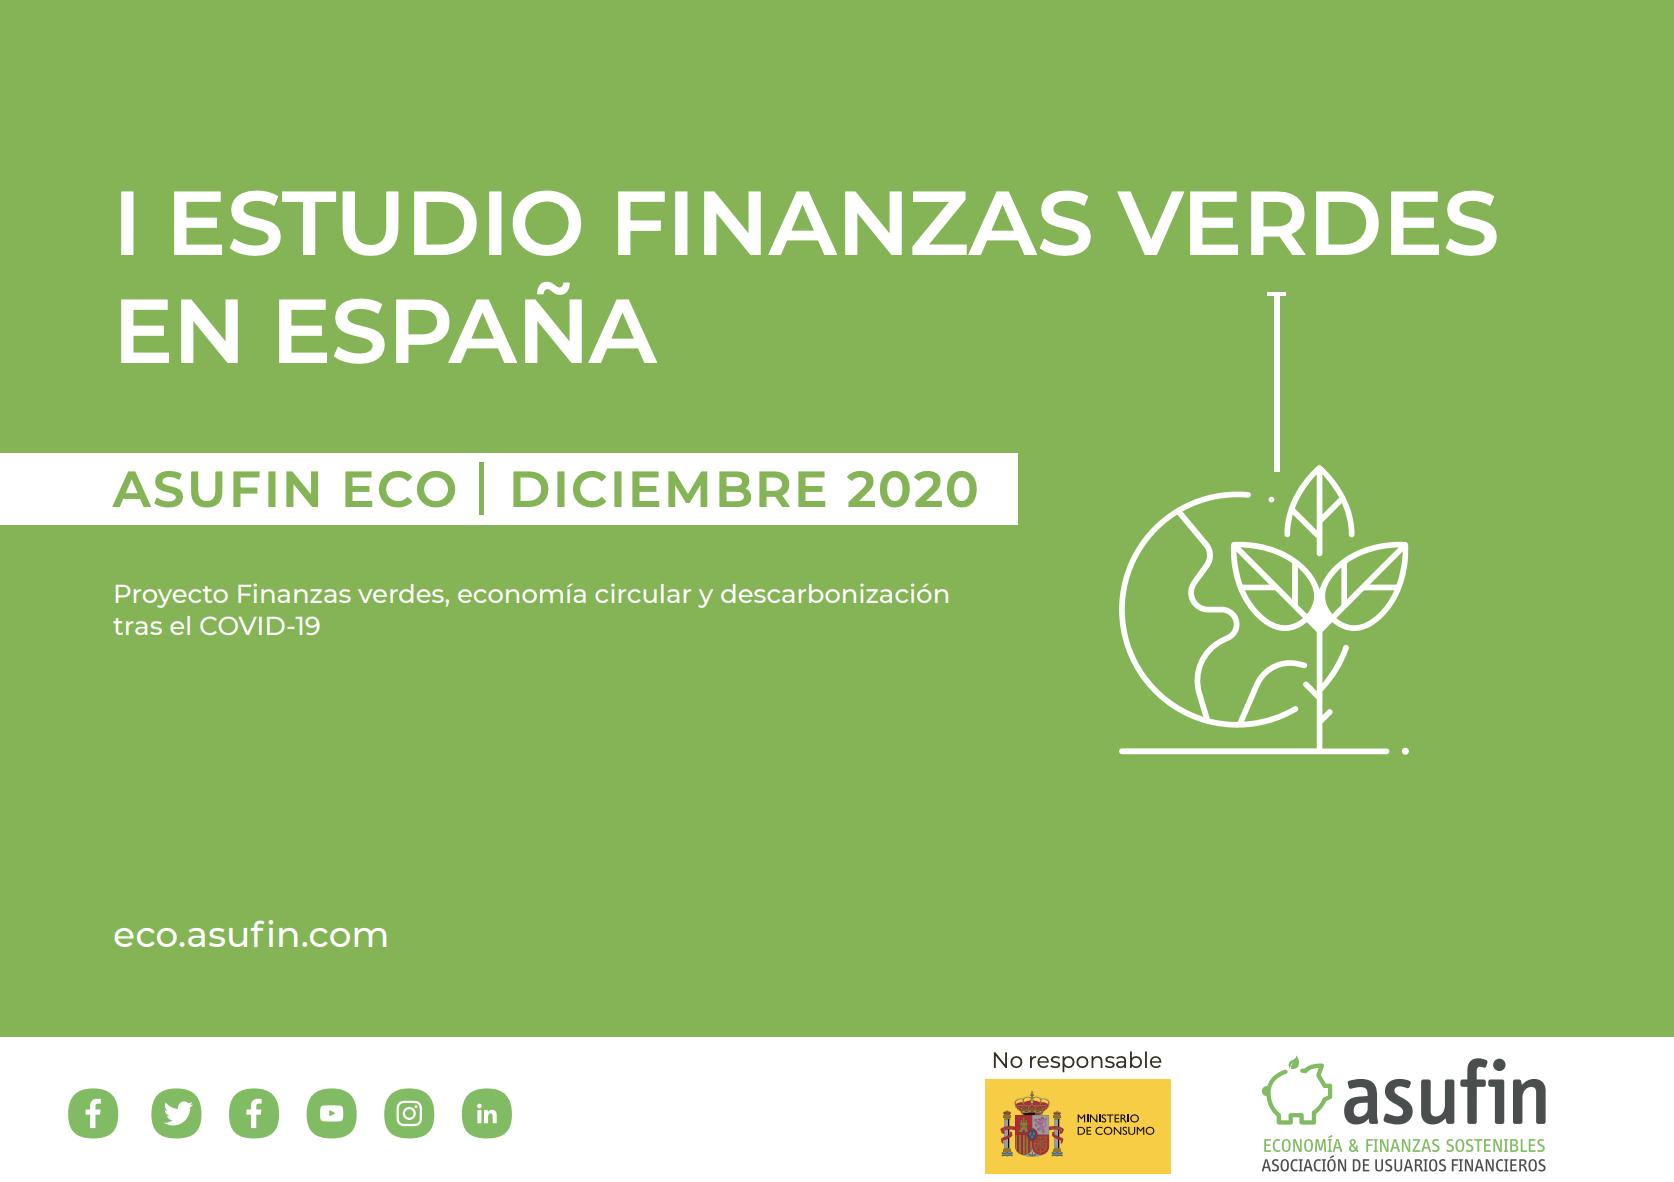 I Estudio Finanzas verdes en España